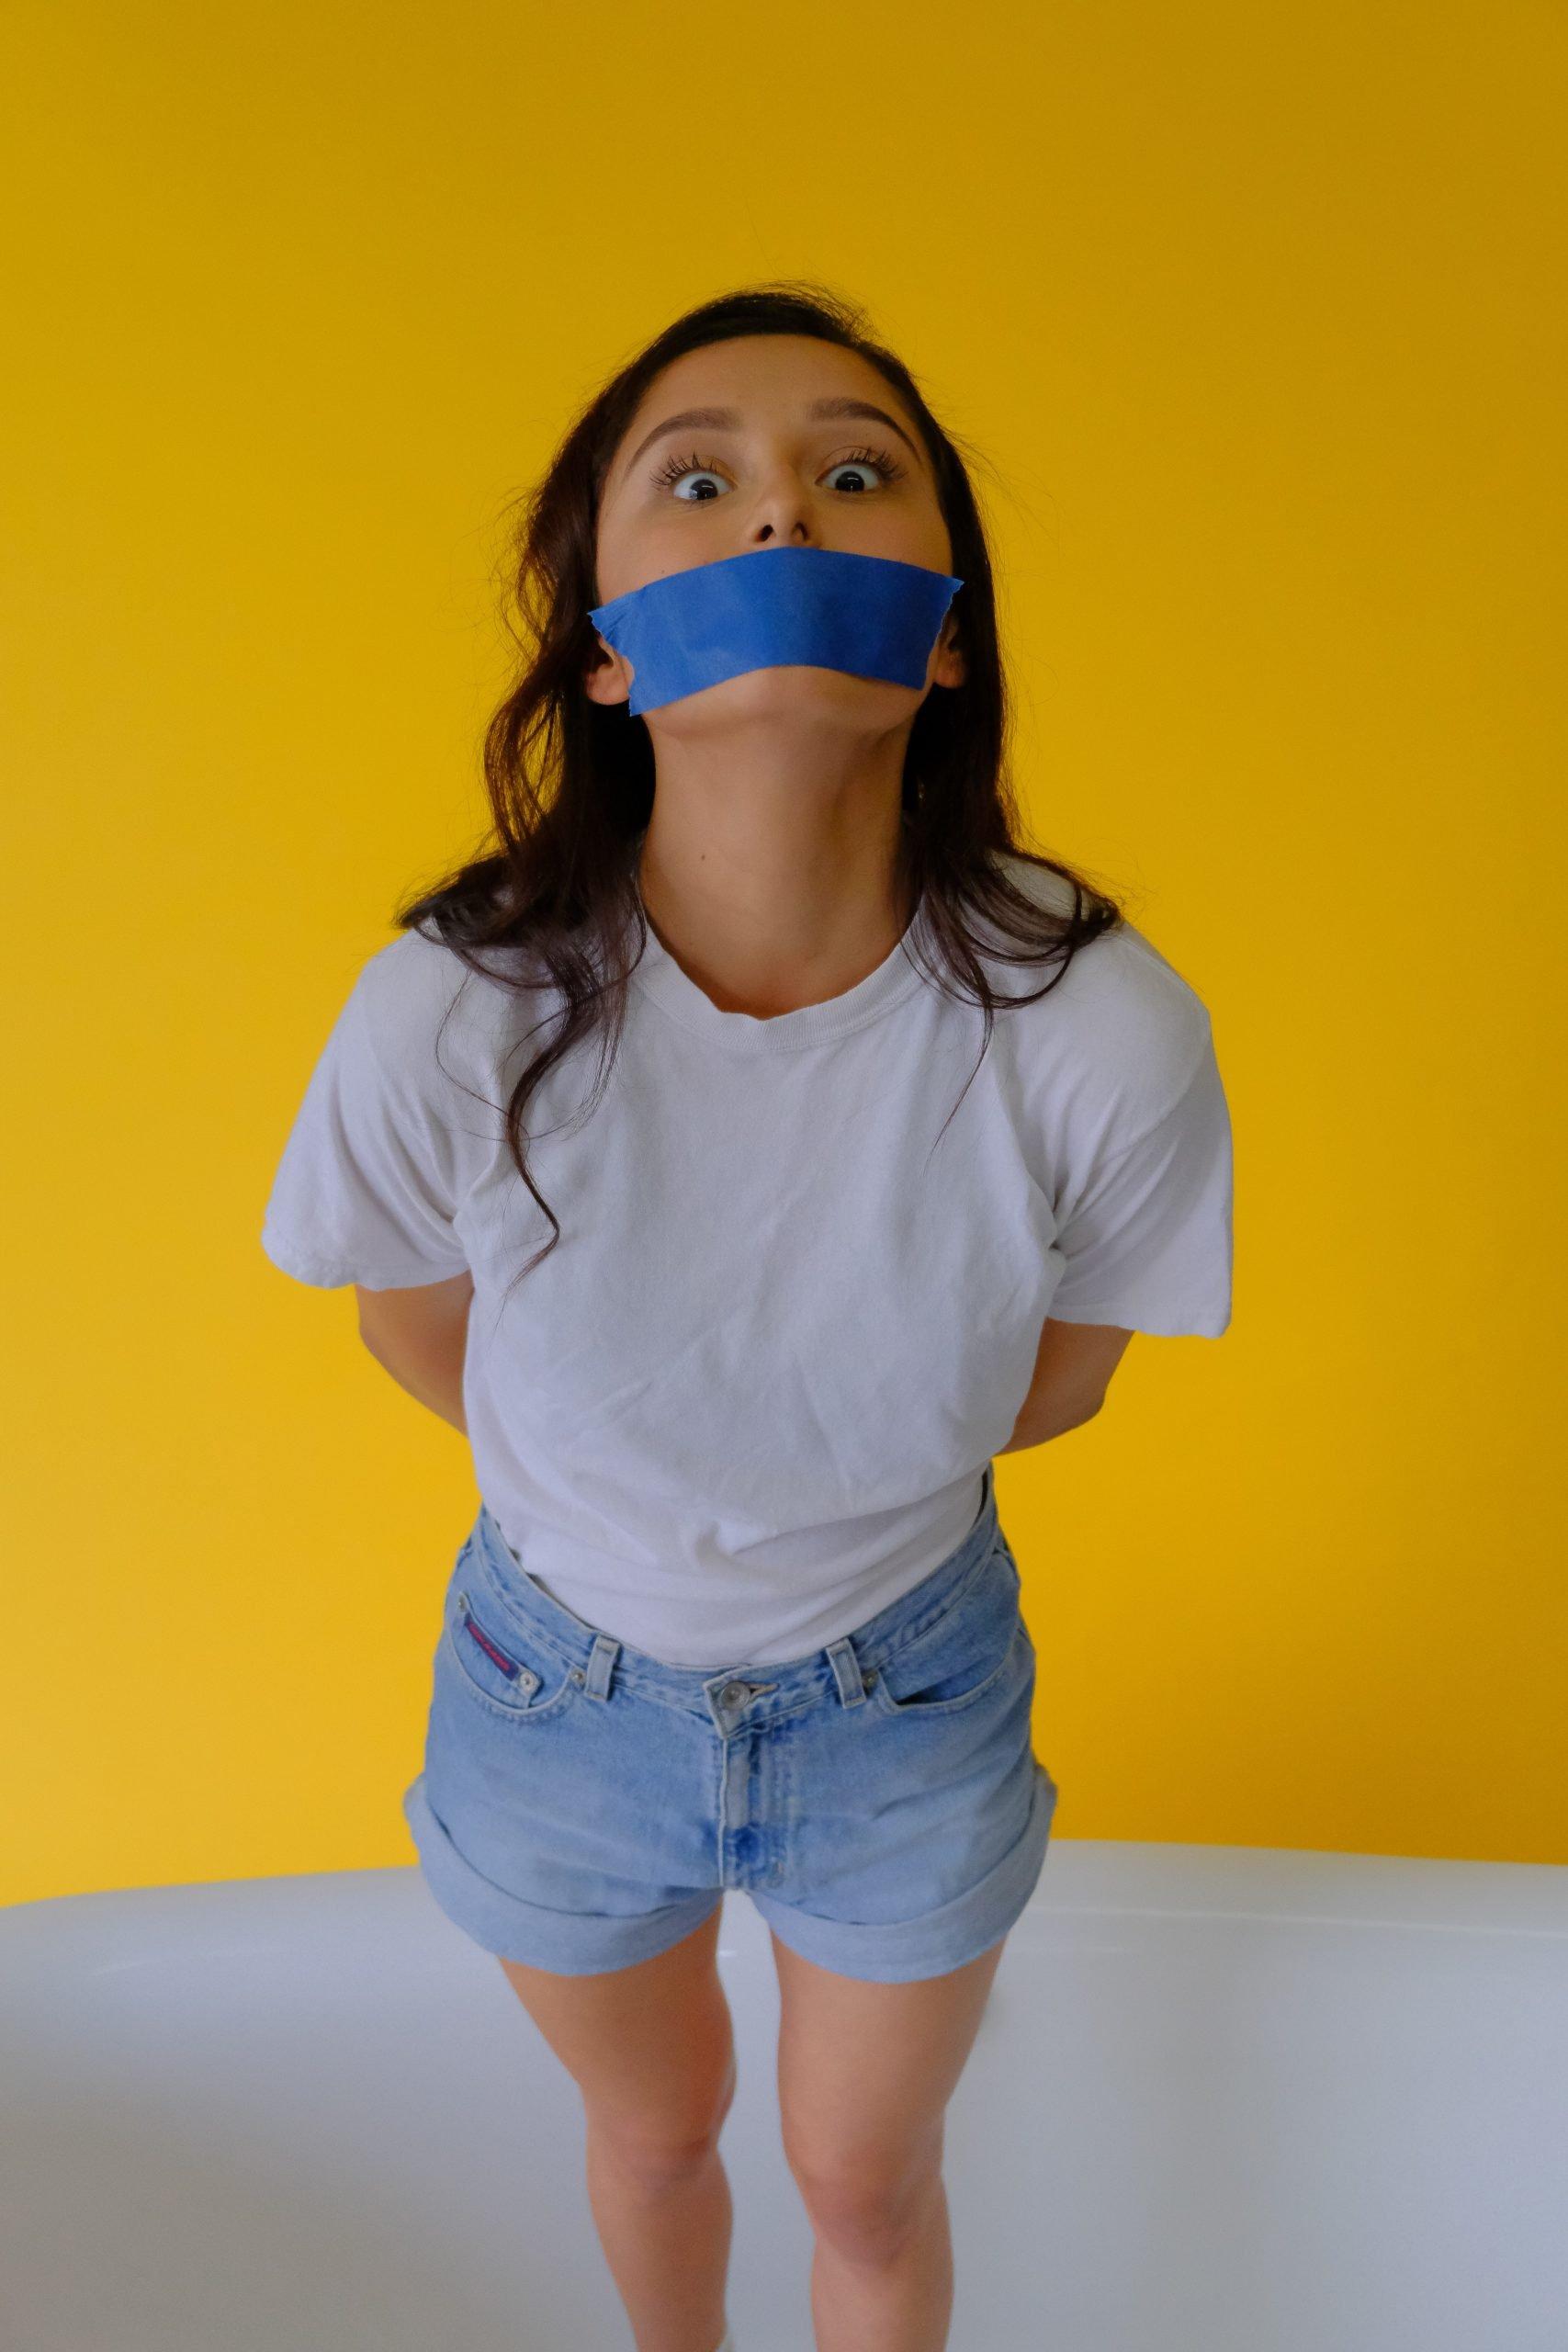 Photo depicting censorship